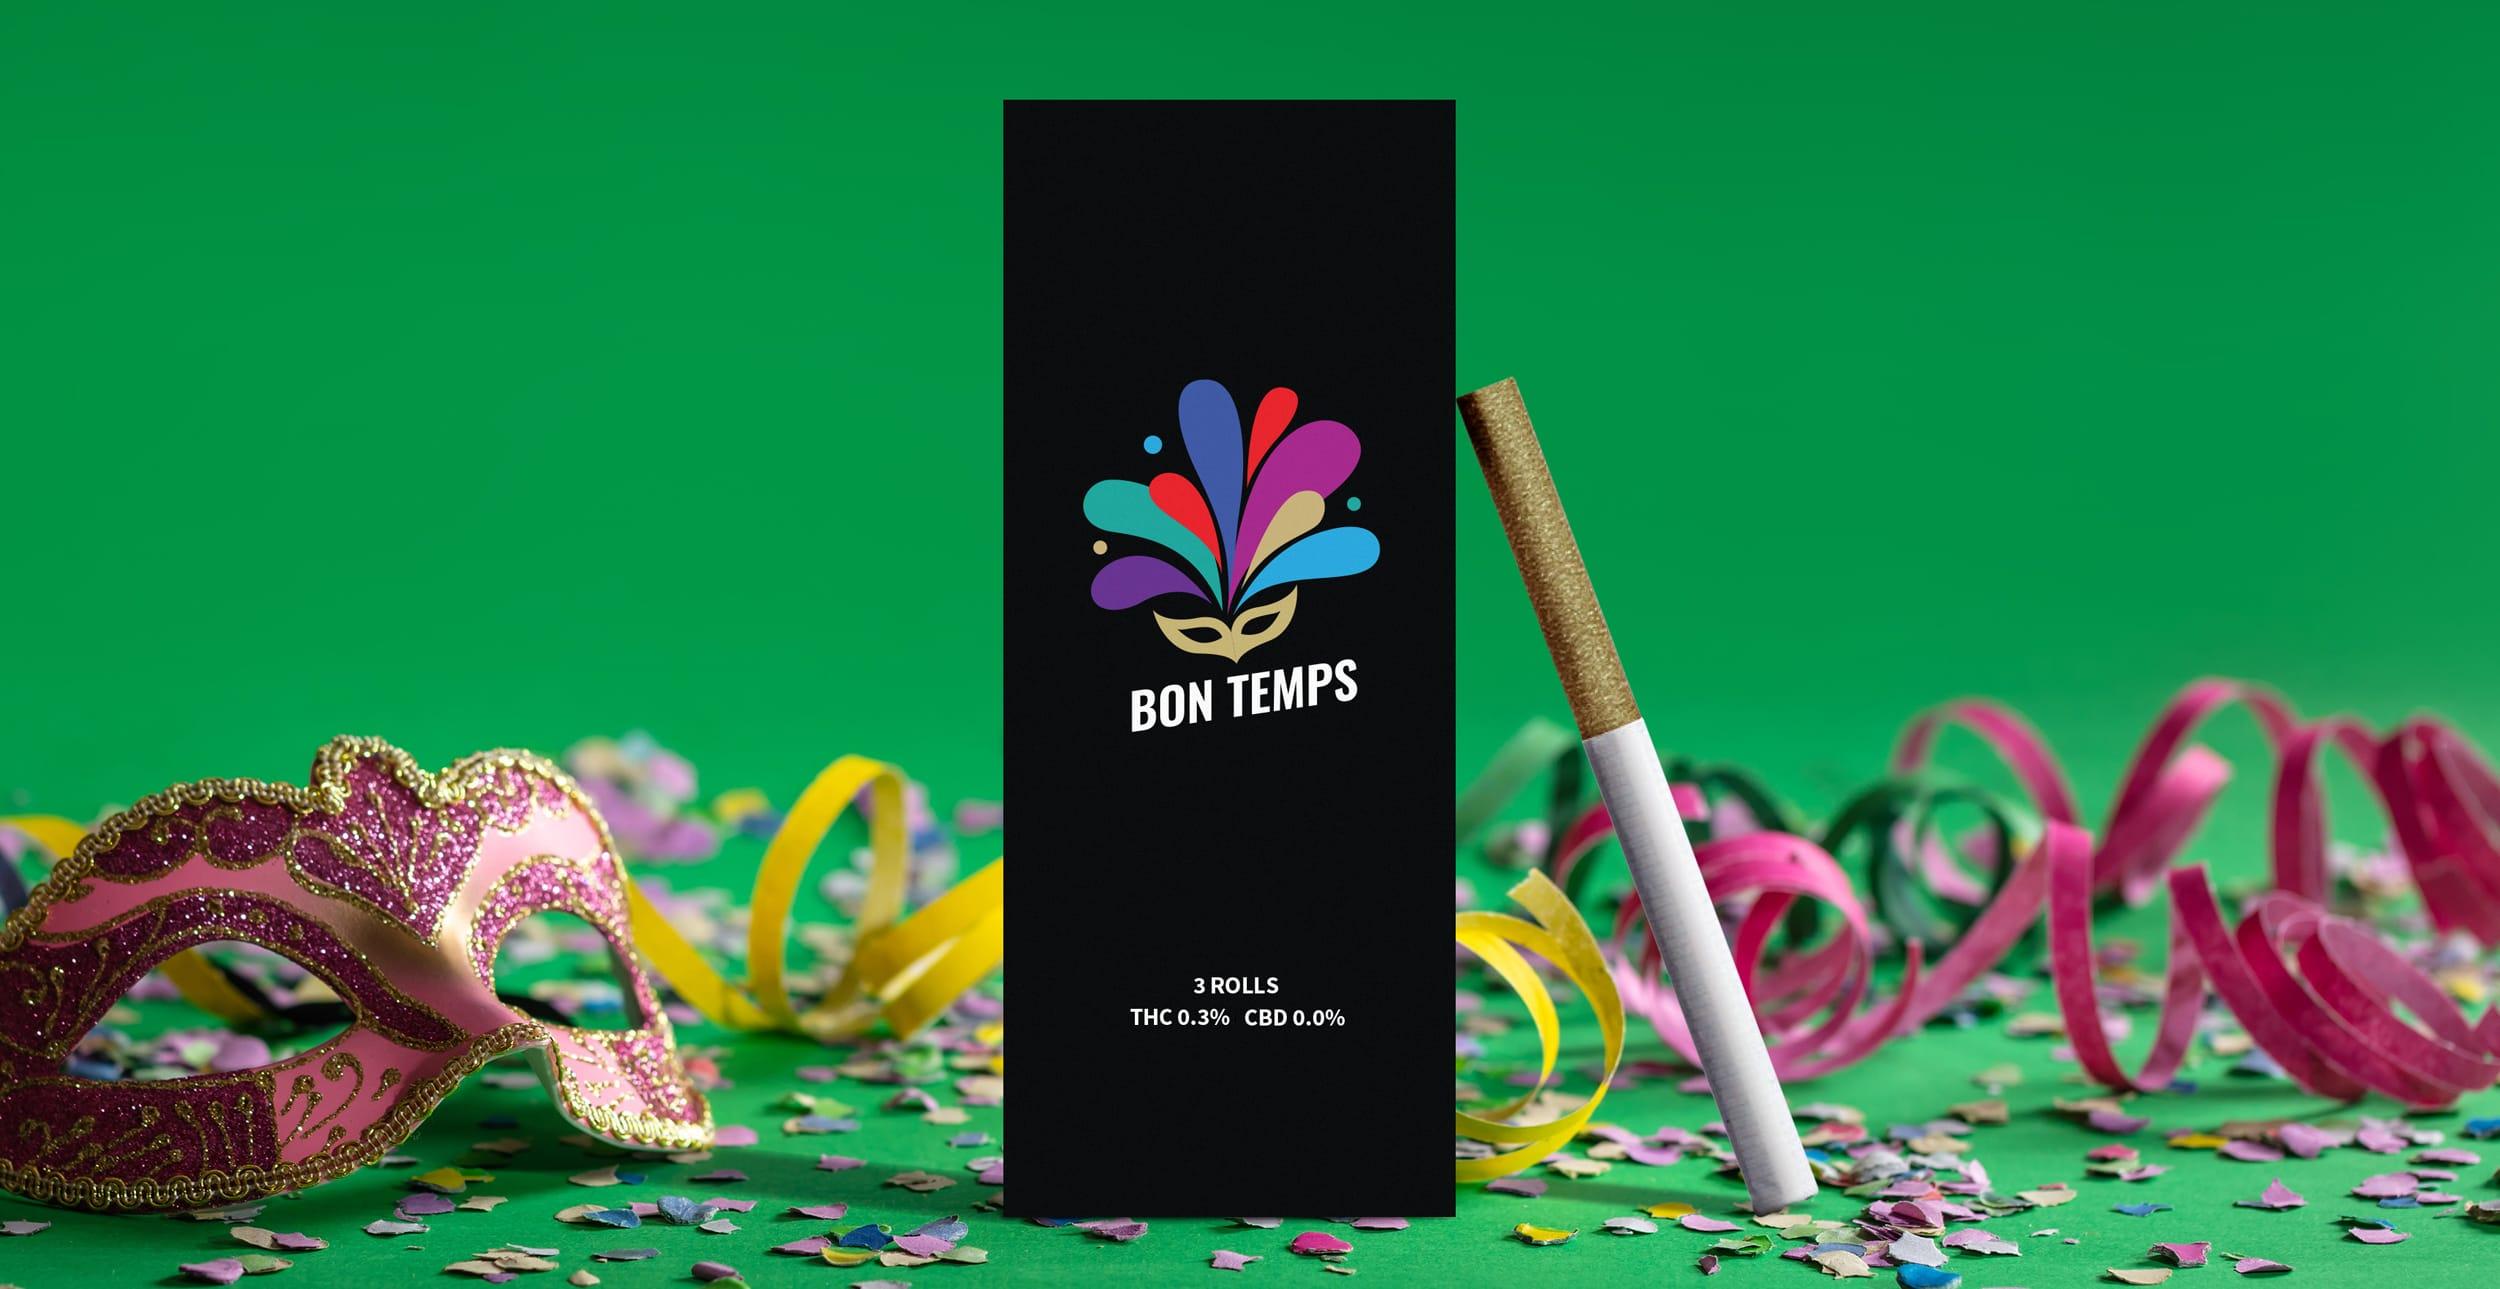 Celebratory Cannabis Brand